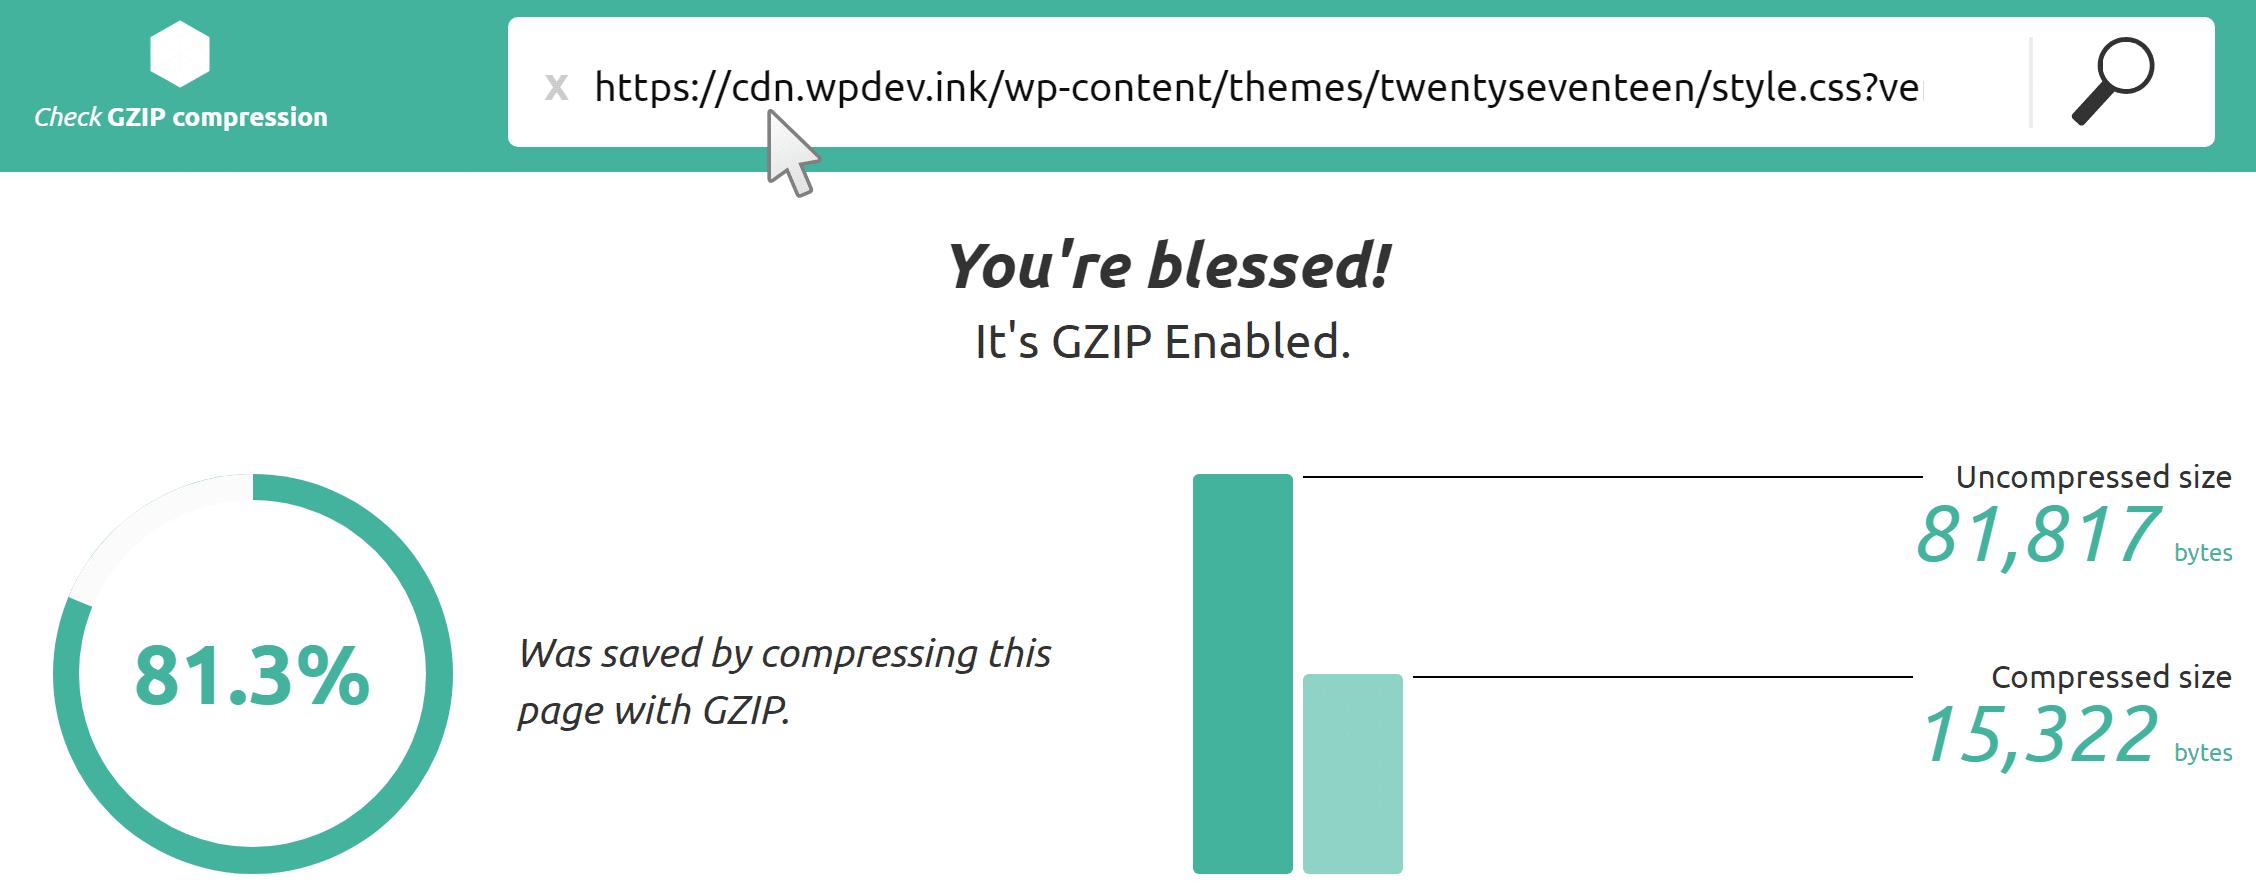 Vérifier compression GZIP CDN